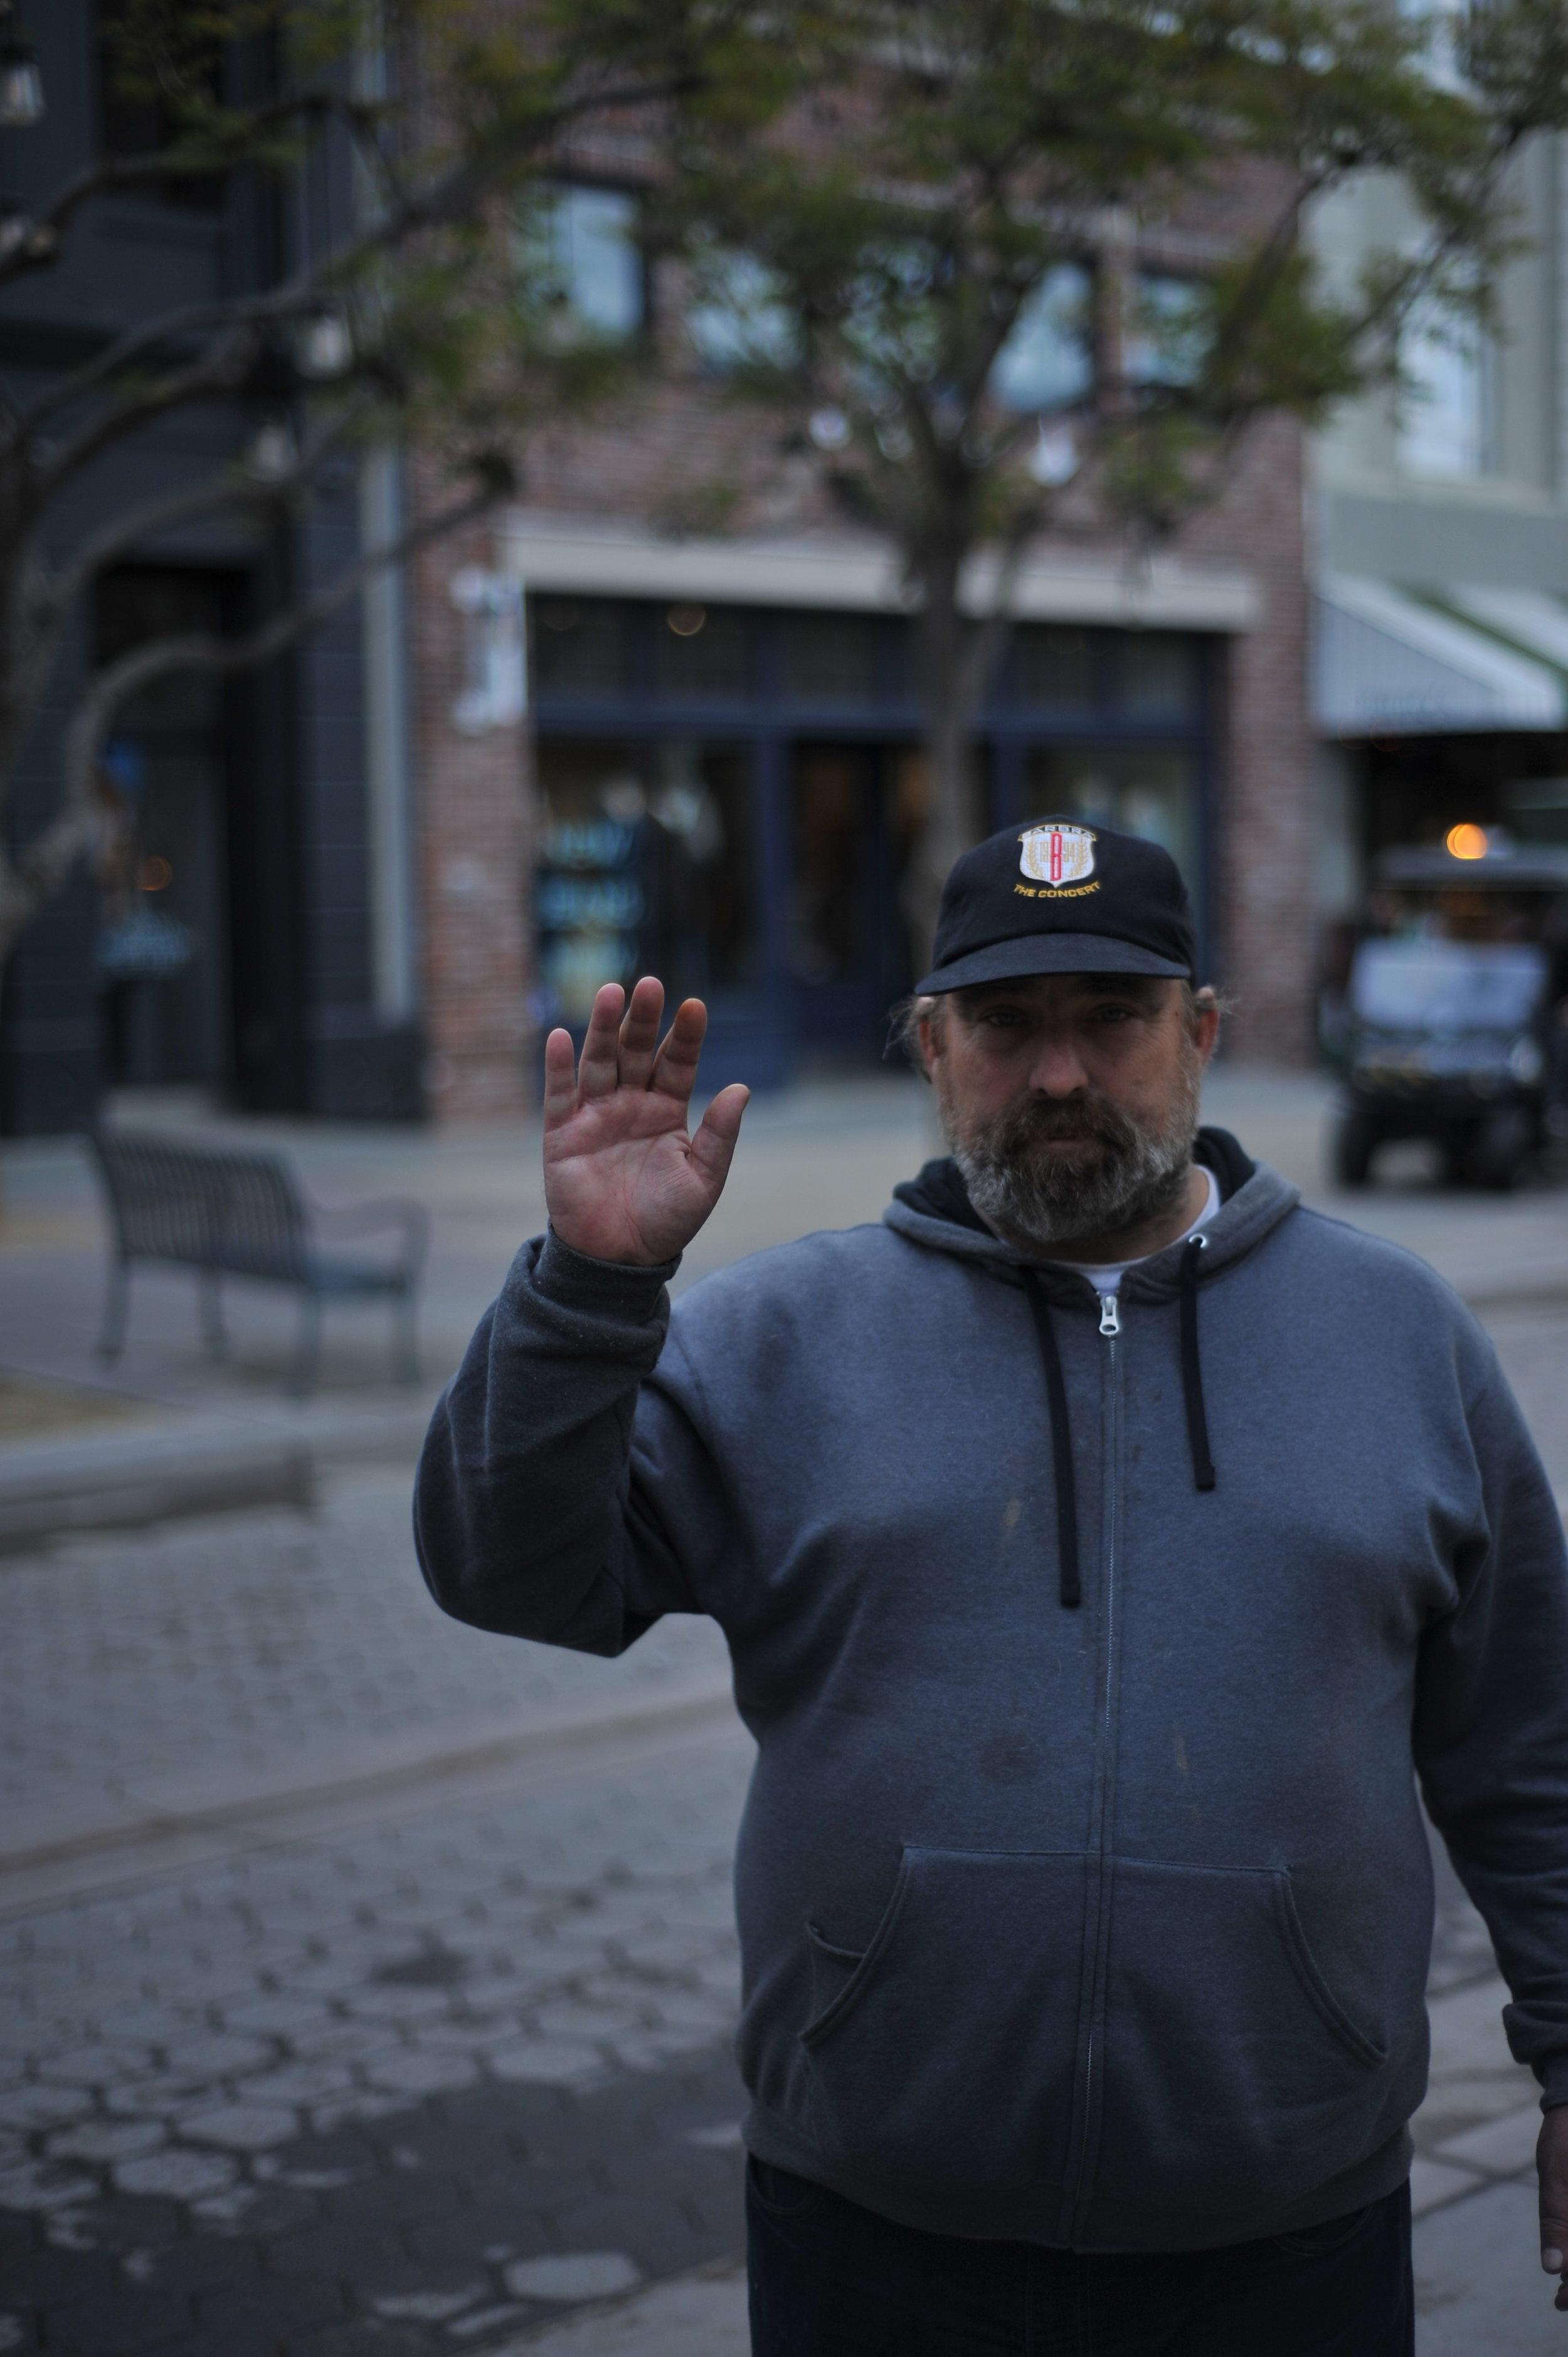 Michael - a homeless man I met on the street of Promenade.